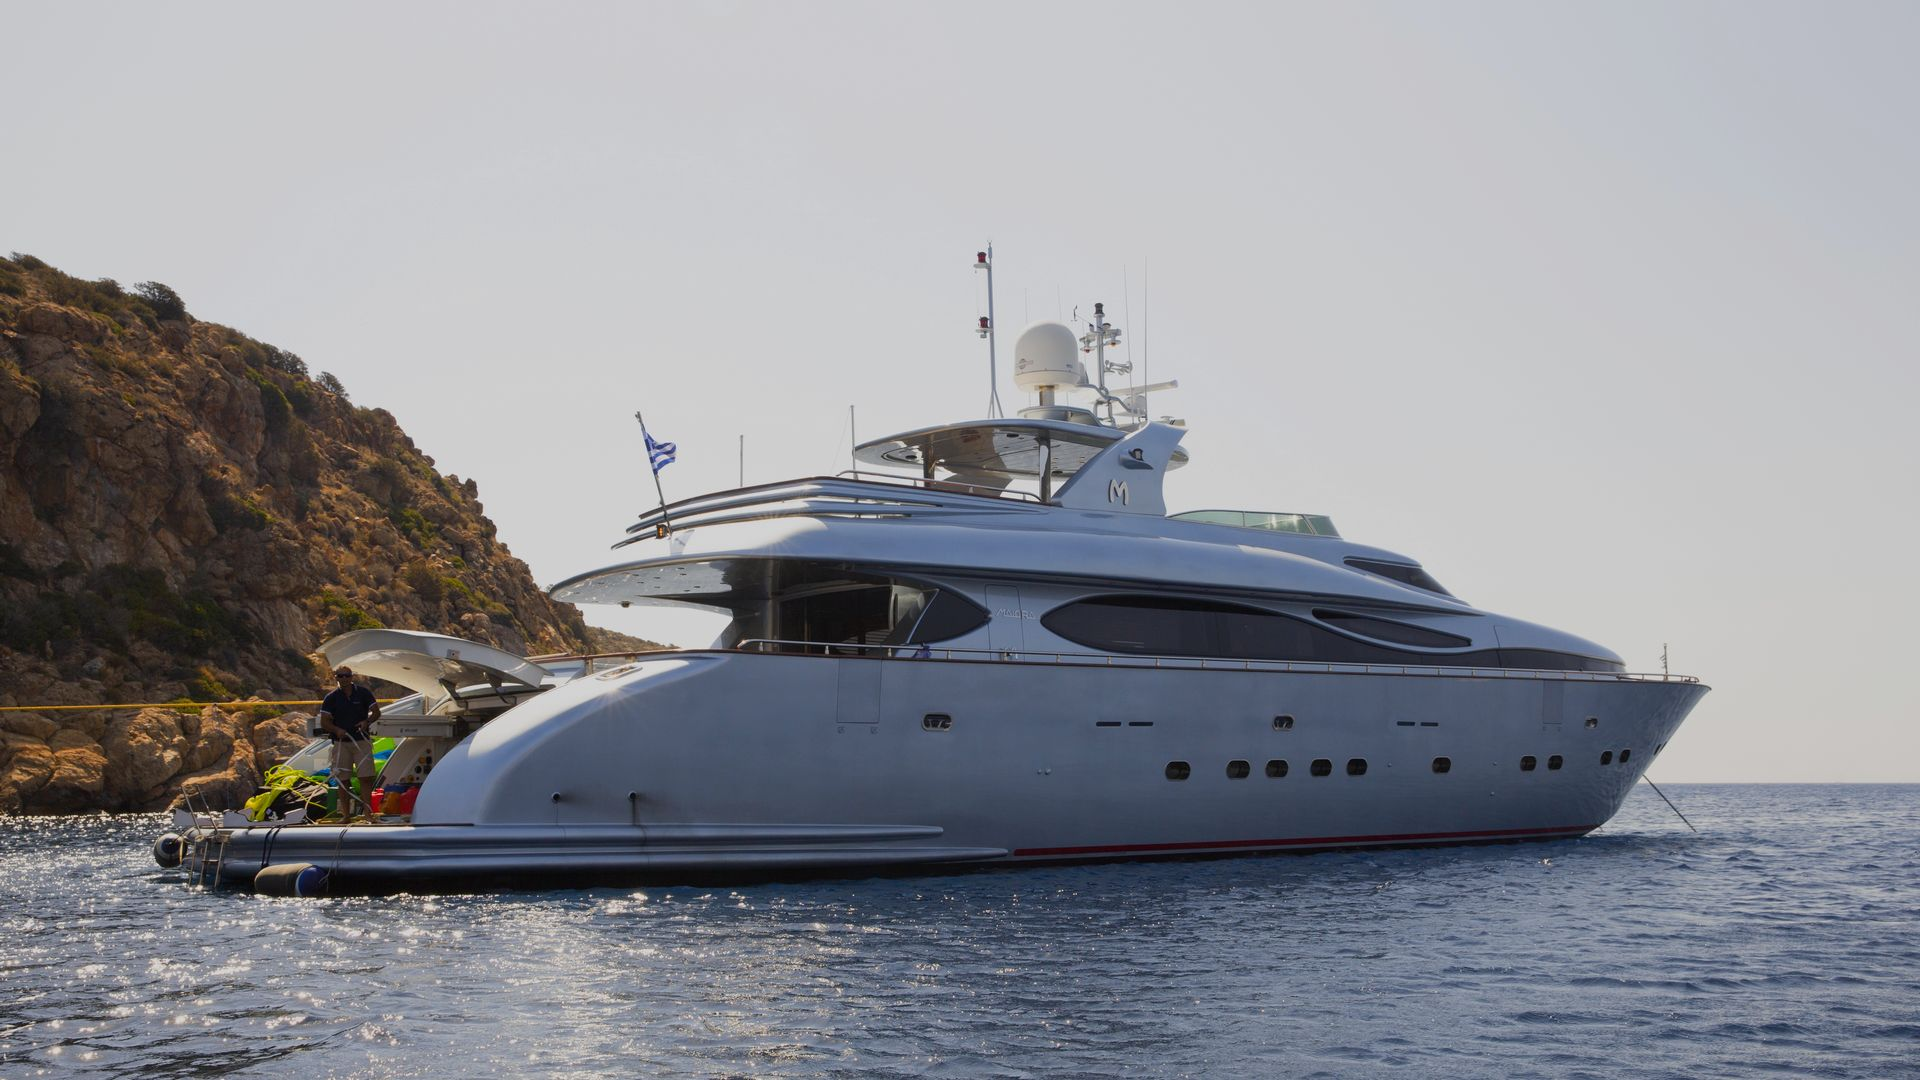 Princess-L-Boat-charter-greece-Background-2